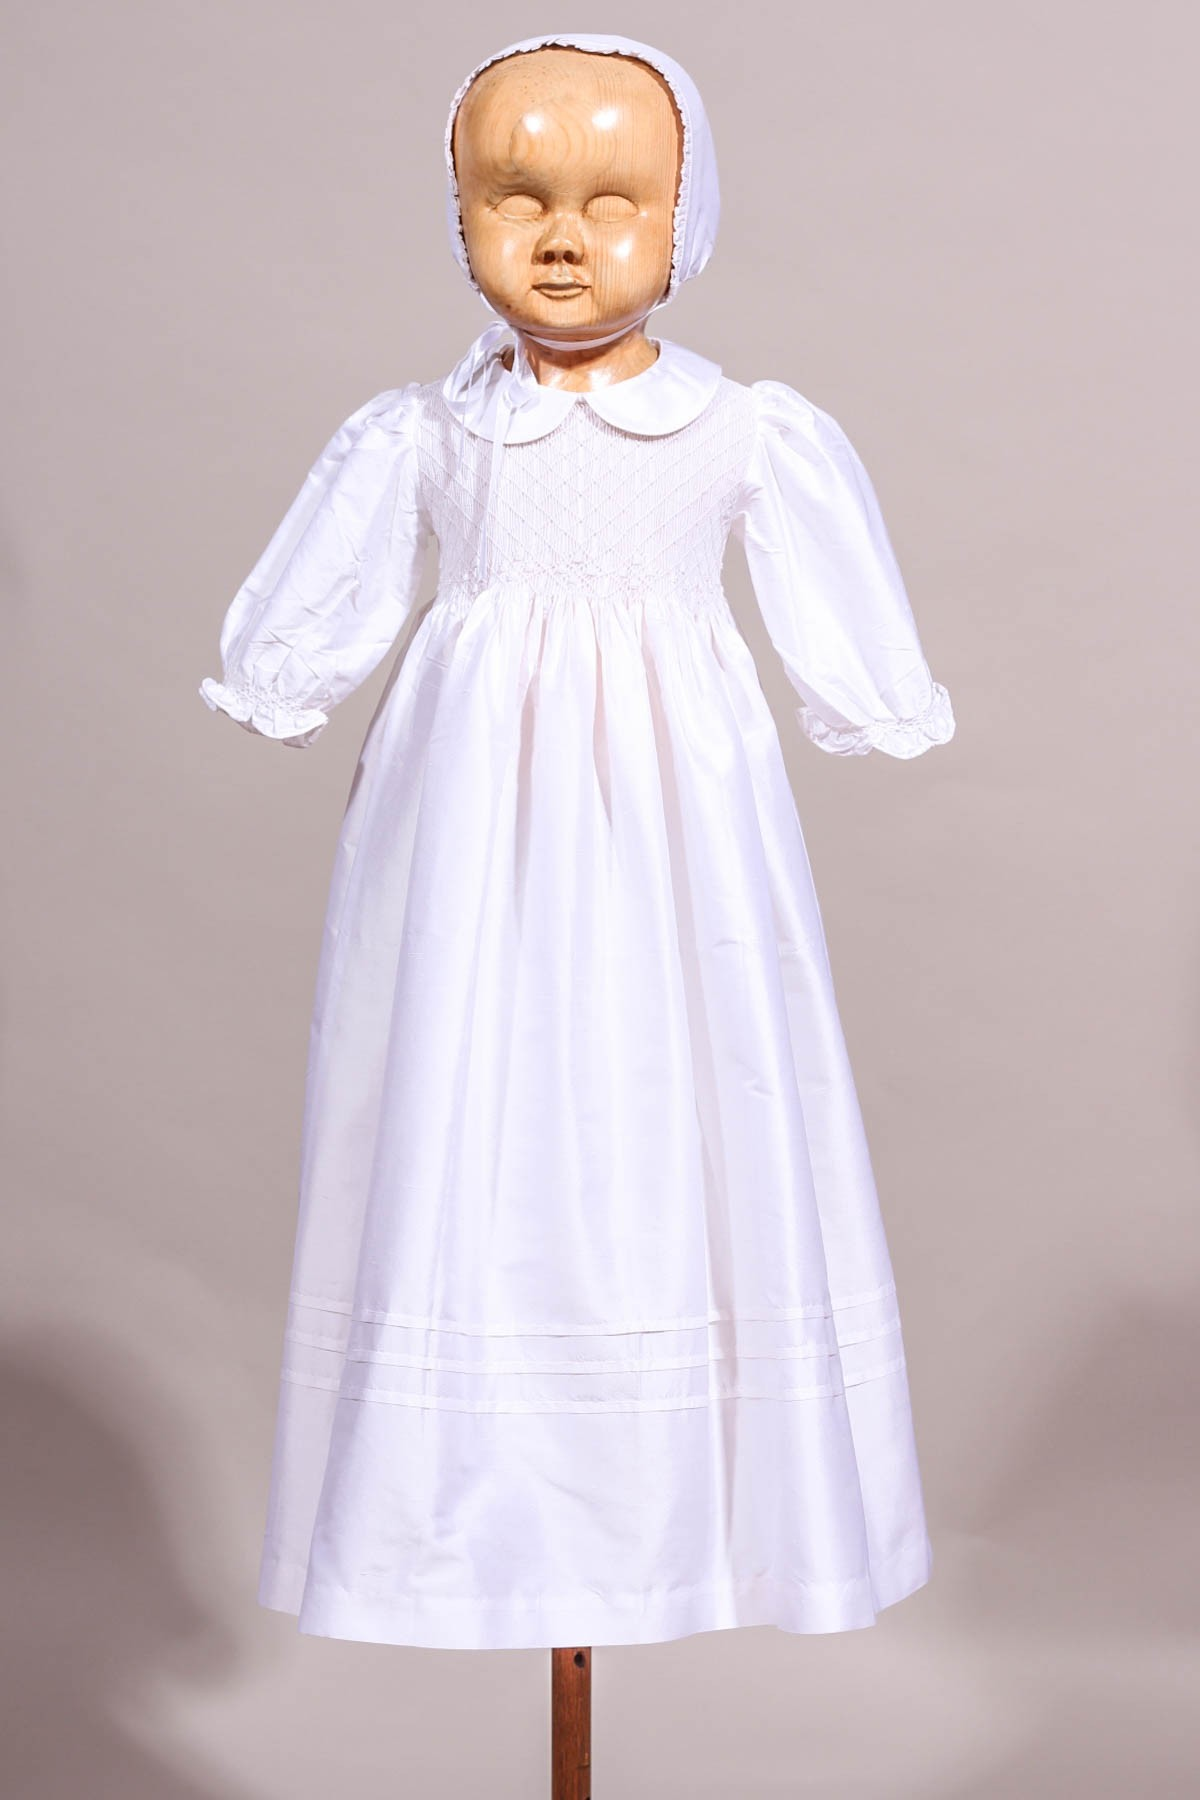 bf57c4afcfd5e Robe de baptême à smocks en soie sauvage